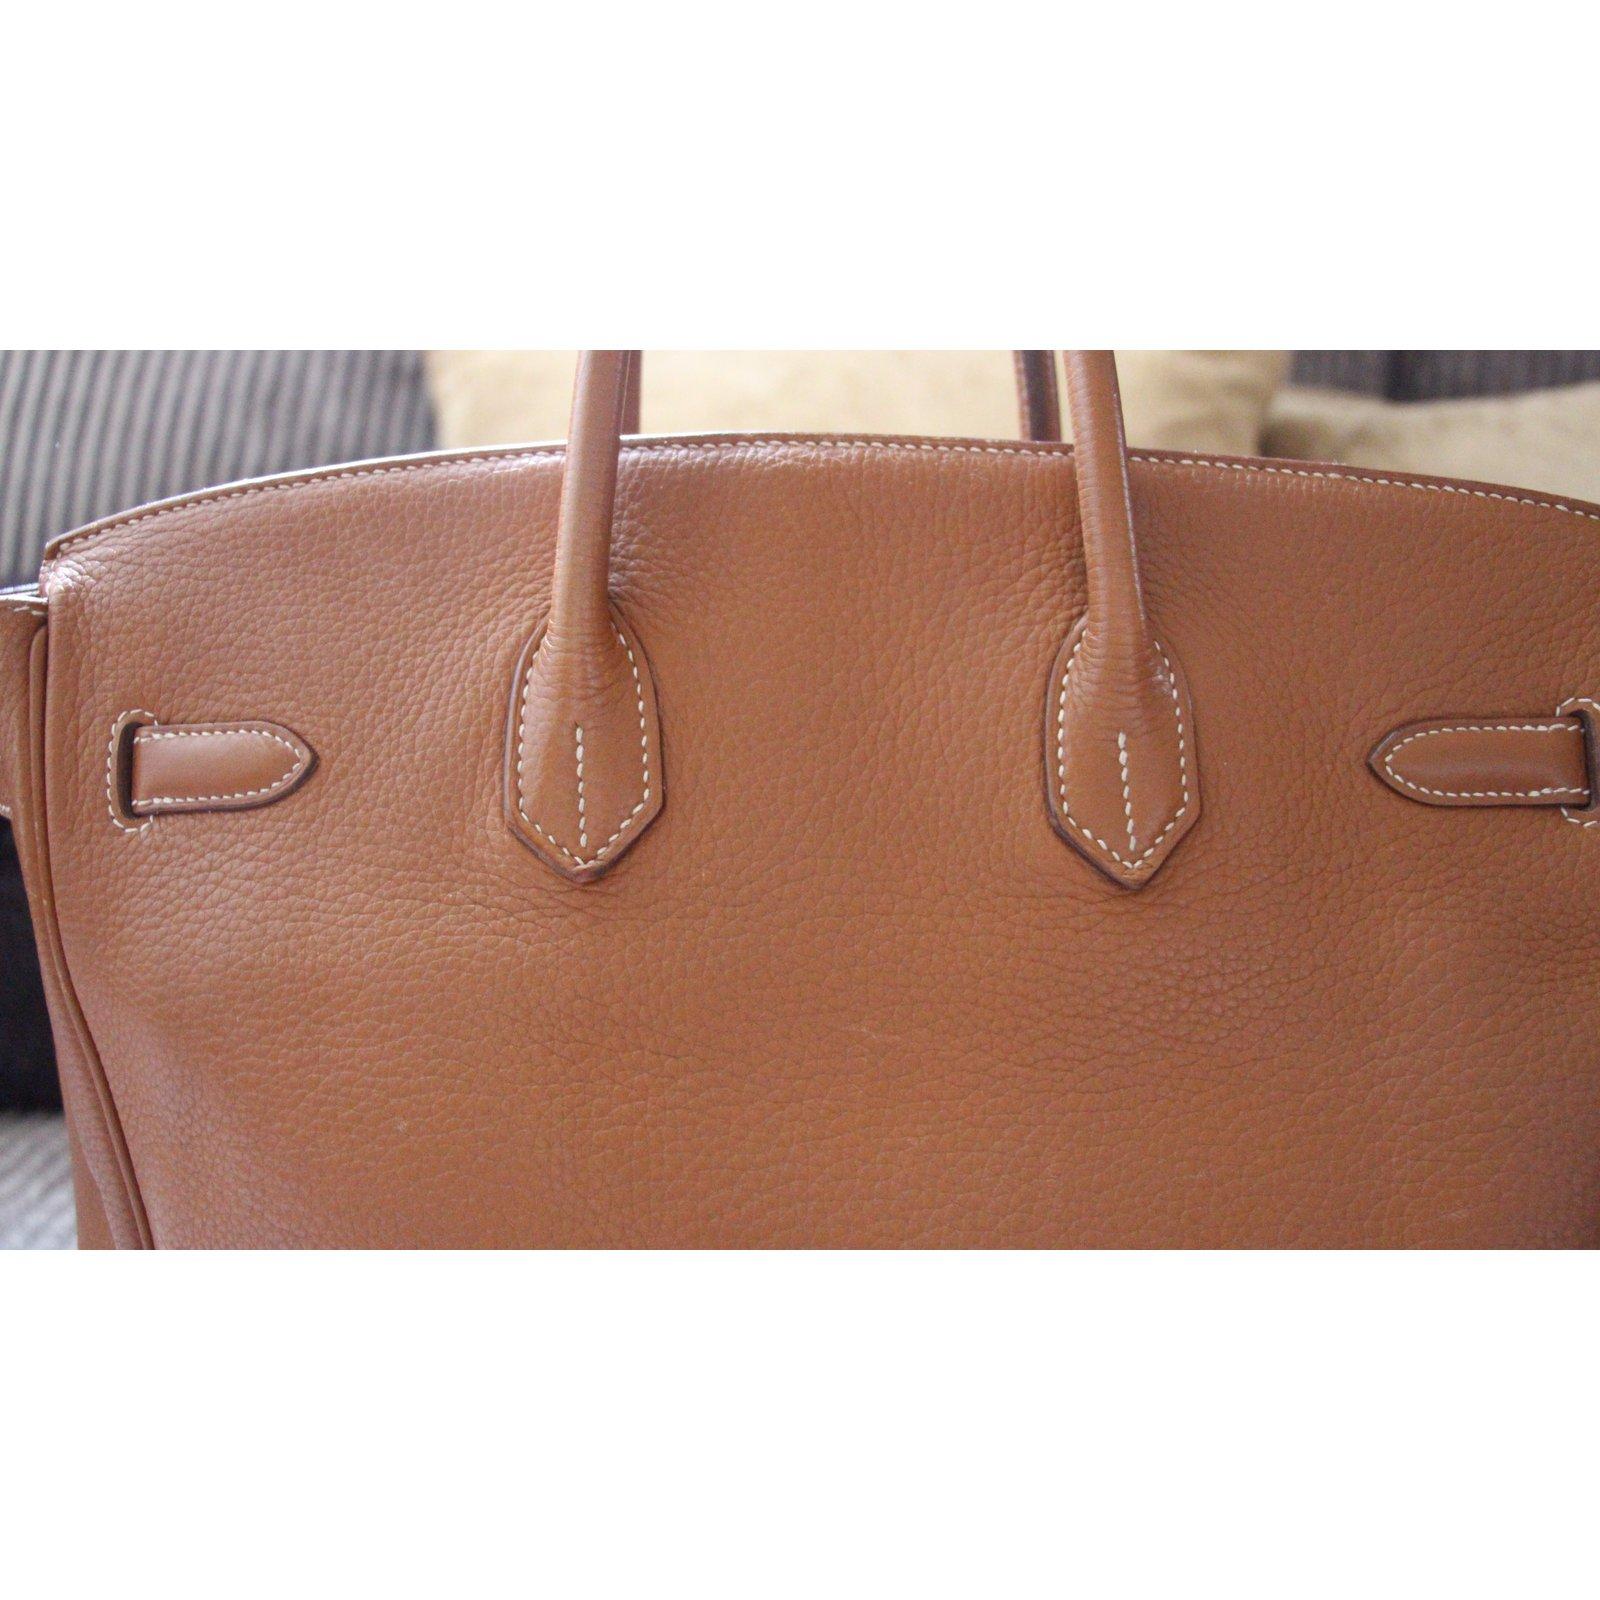 6a2afb5ef5 Hermès Birkin 35 Togo Handbags Leather Other ref.51221 - Joli Closet